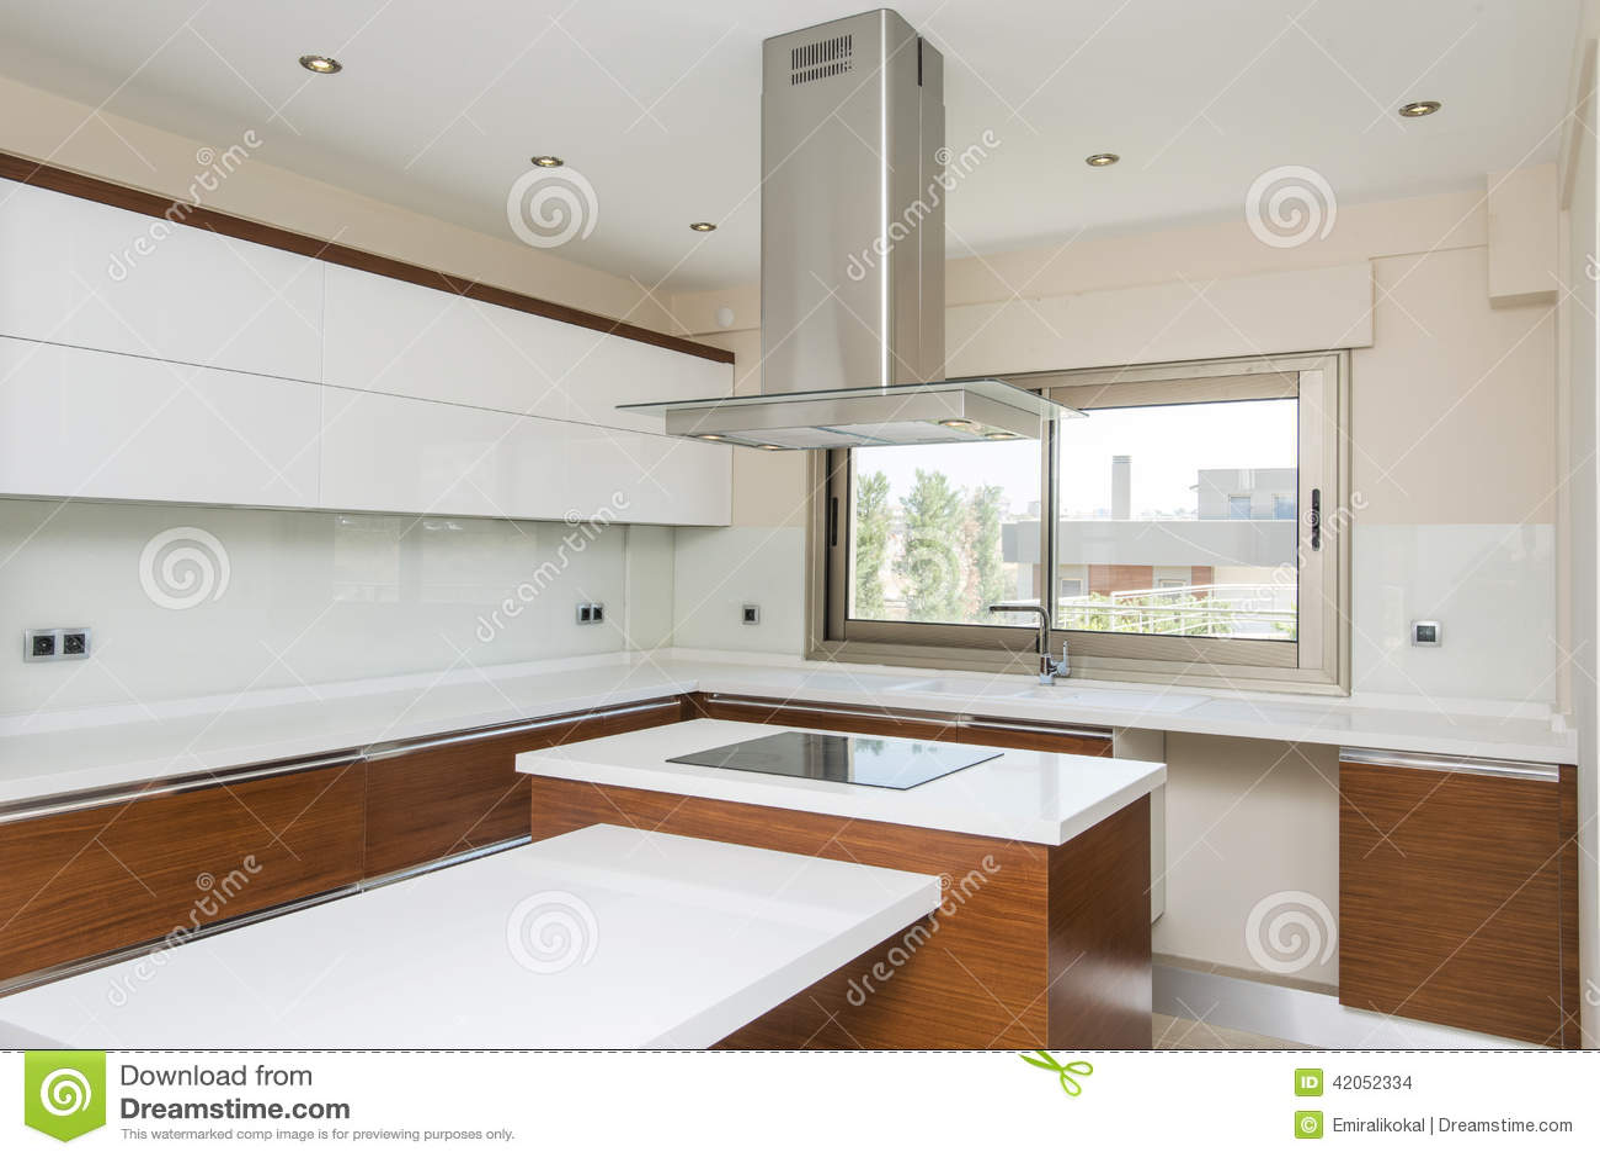 Cucina moderna luminosa fotografia stock immagine 42052334 for Cucina moderna quadrata